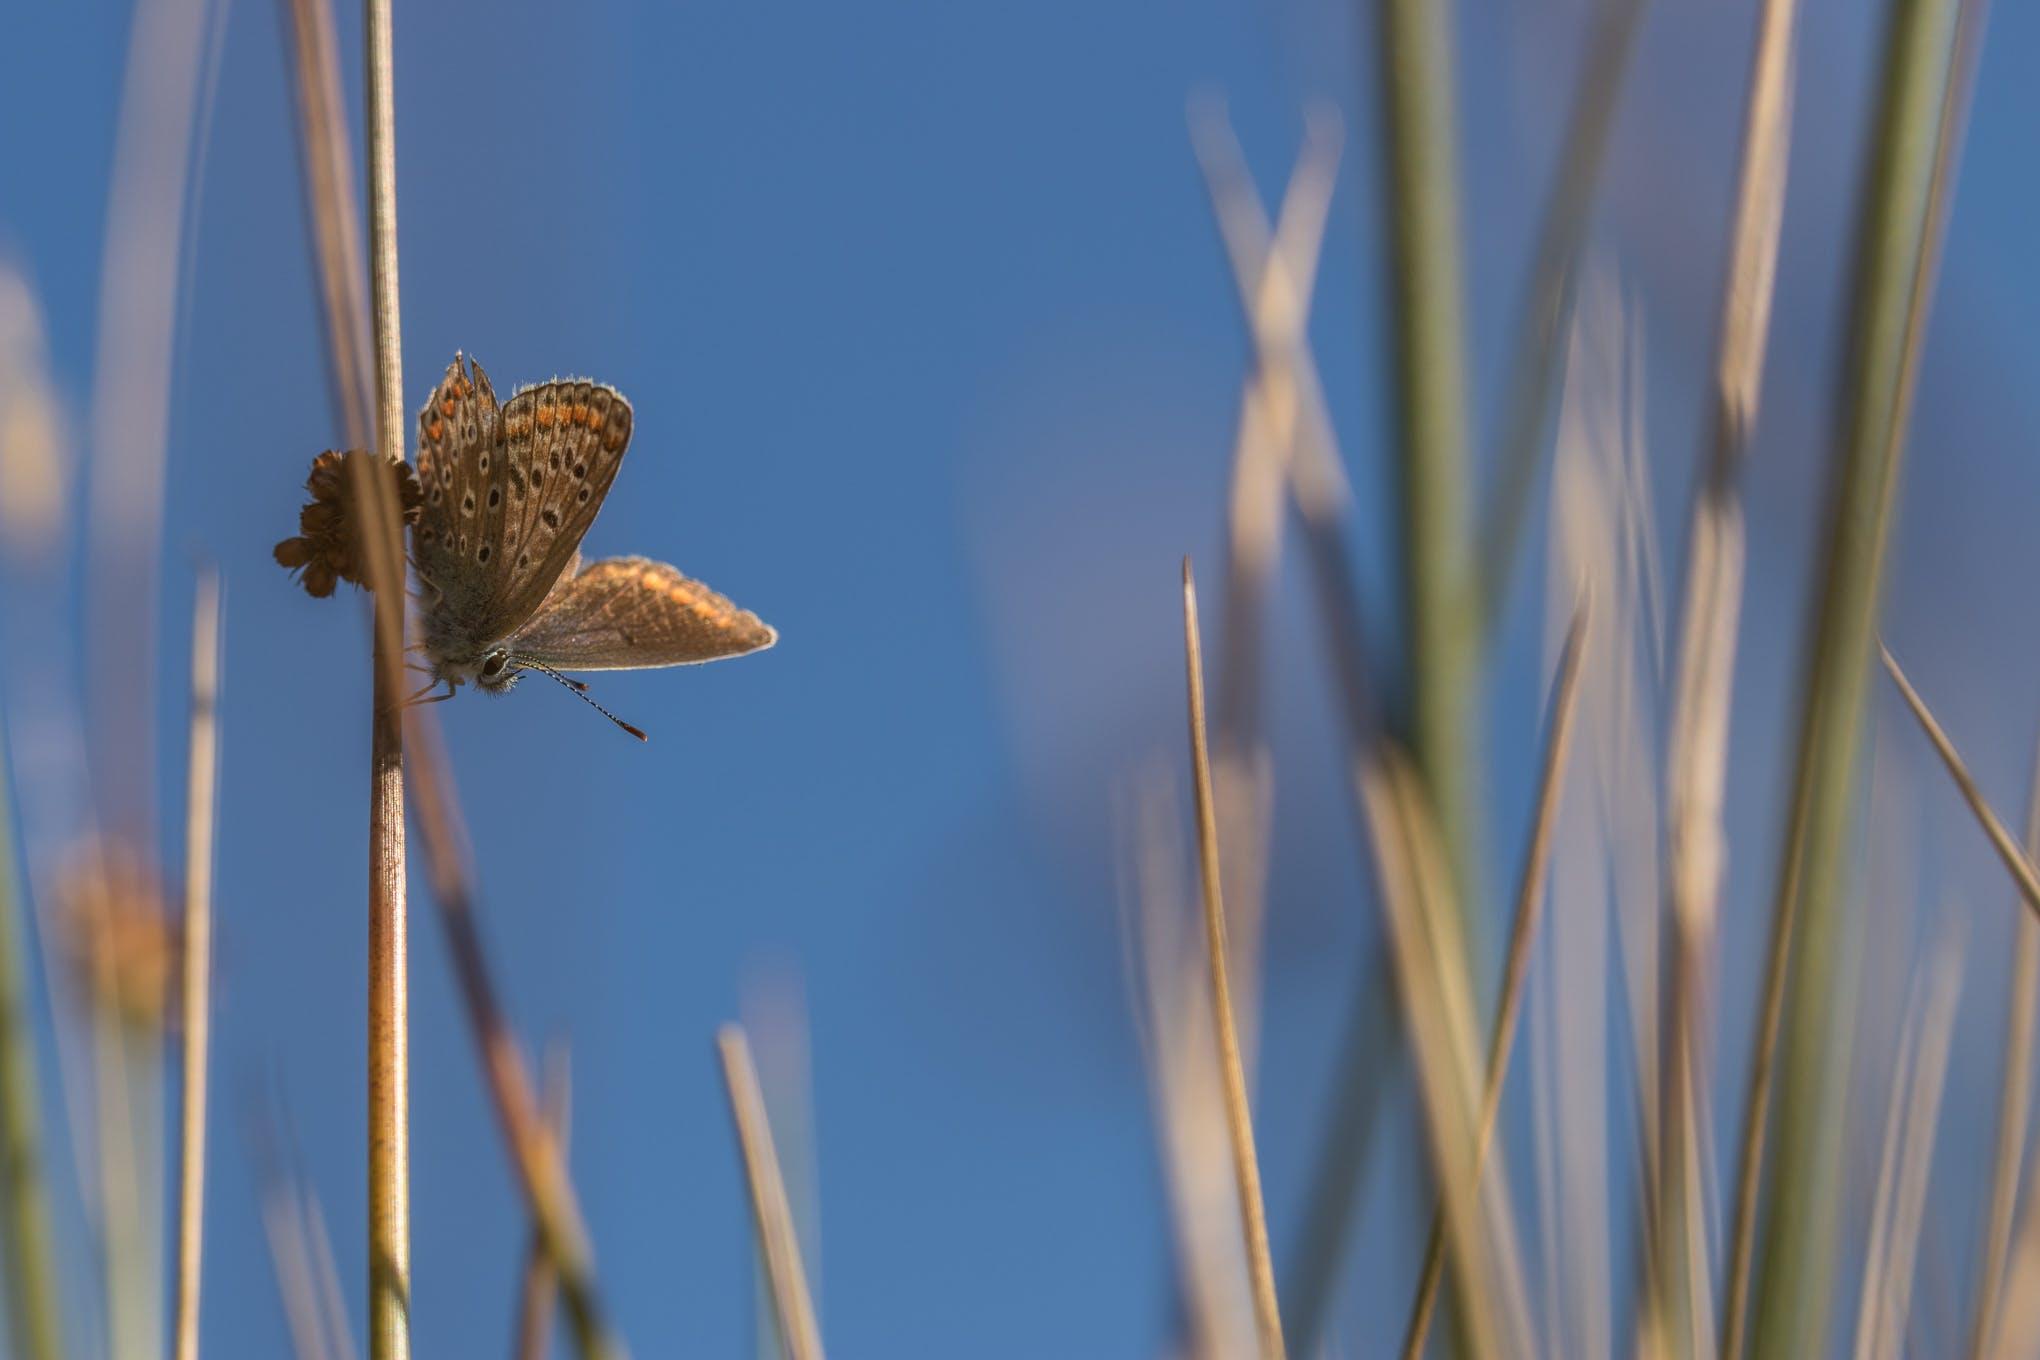 Kostenloses Stock Foto zu #butterfly #heideblauwtje #blauw #bleu